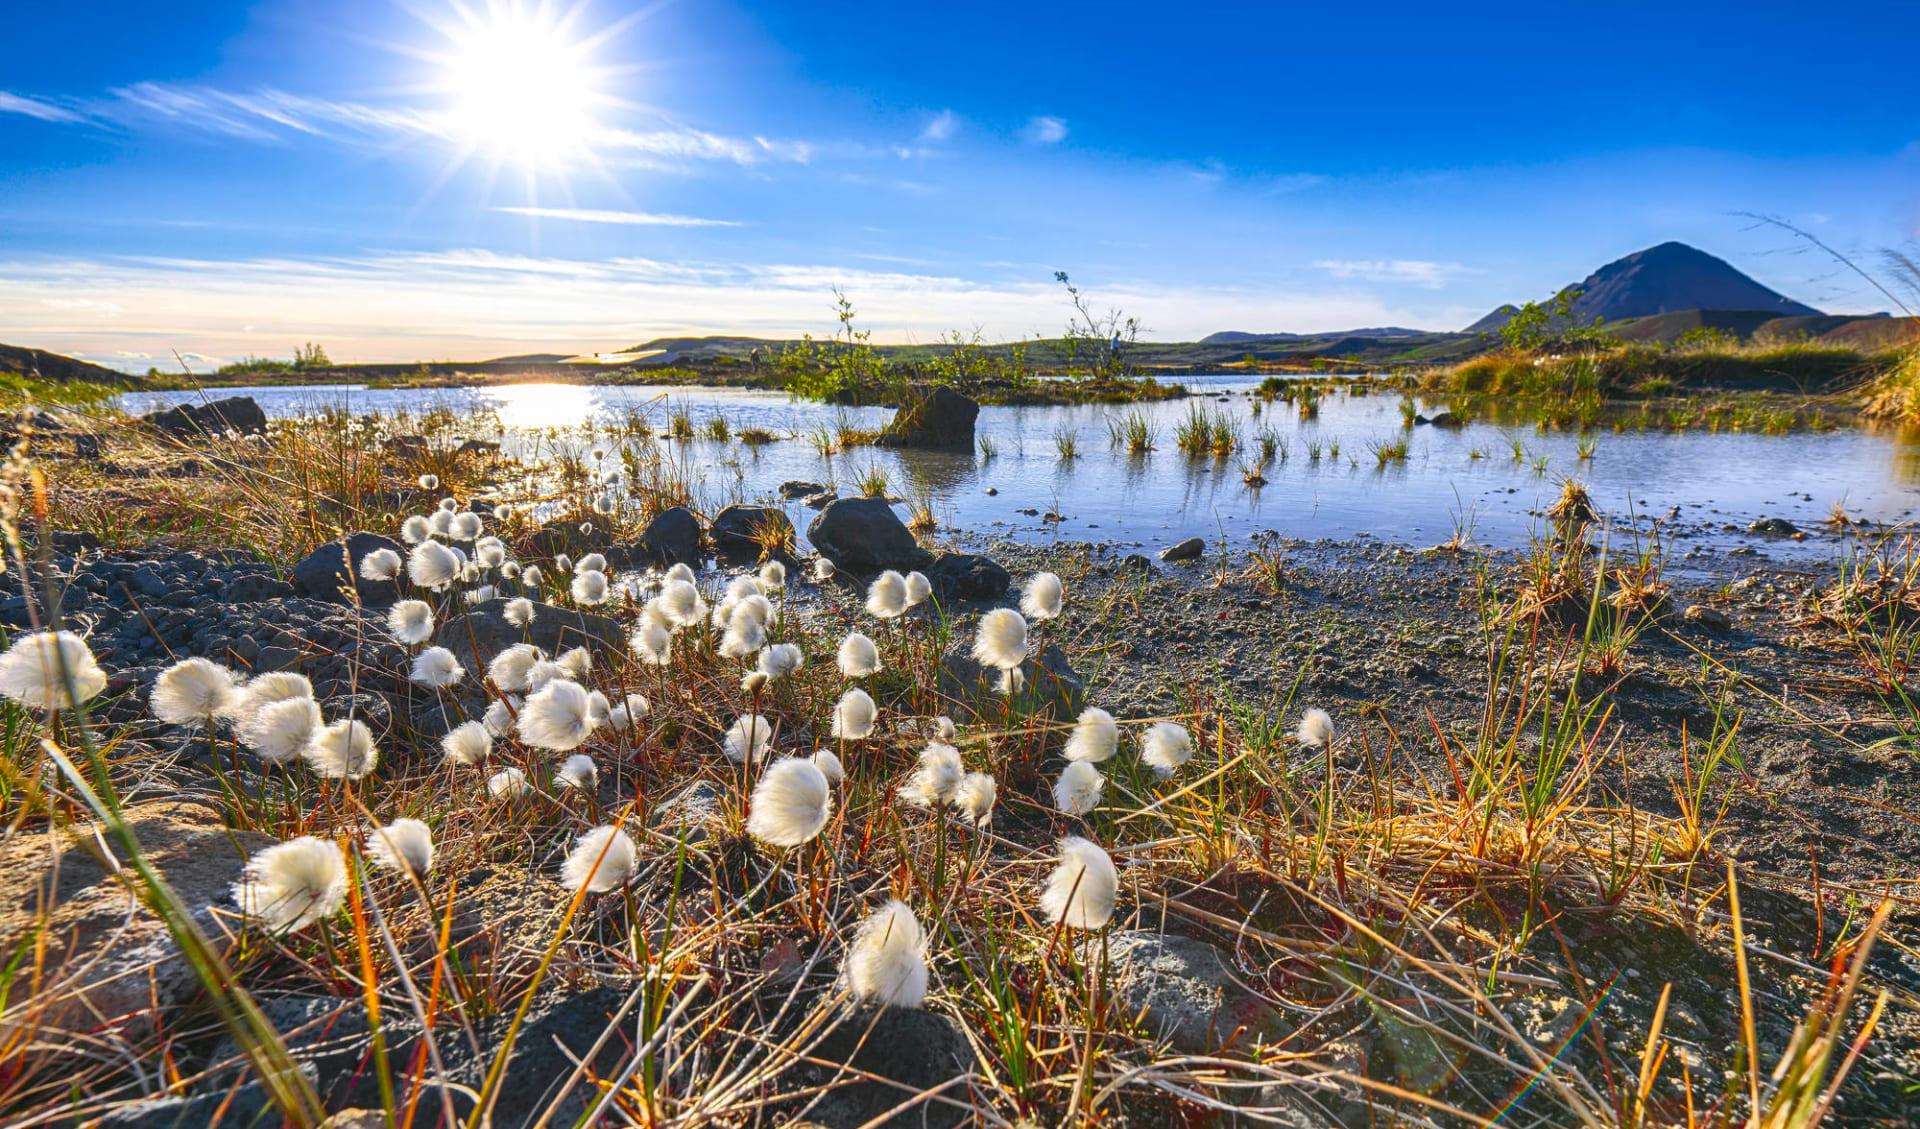 Skútustadir in Myvatn: White fluffy cotton flowers at Myvatn lake. Location: Myvatn region, North part of Iceland, Europe